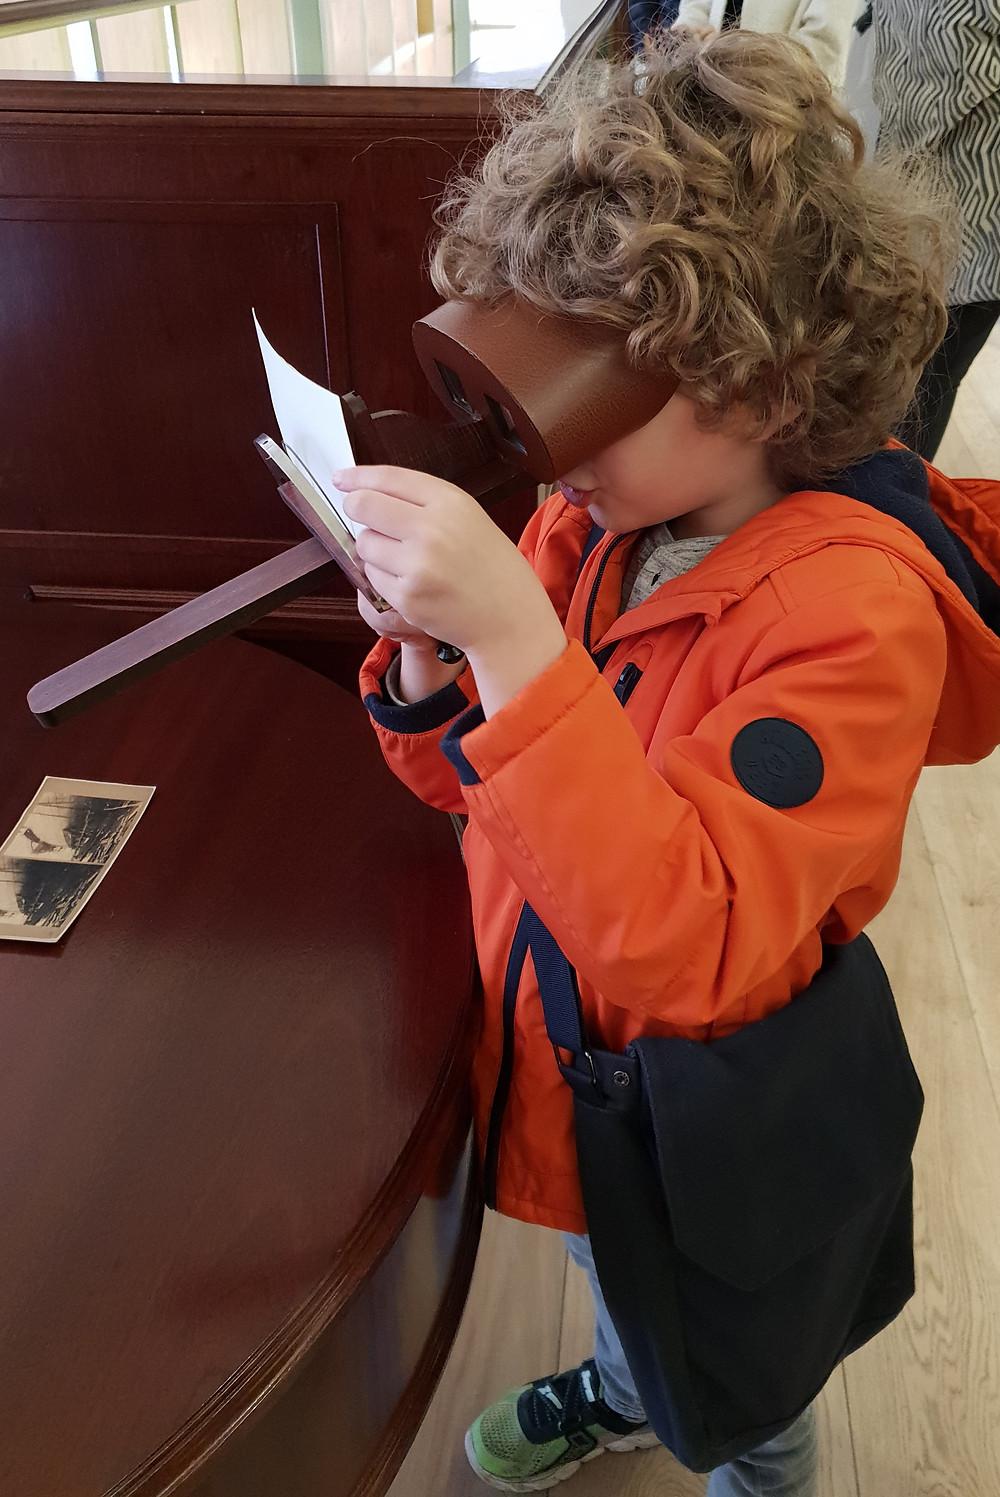 Boy peering through old-fashioned glasses